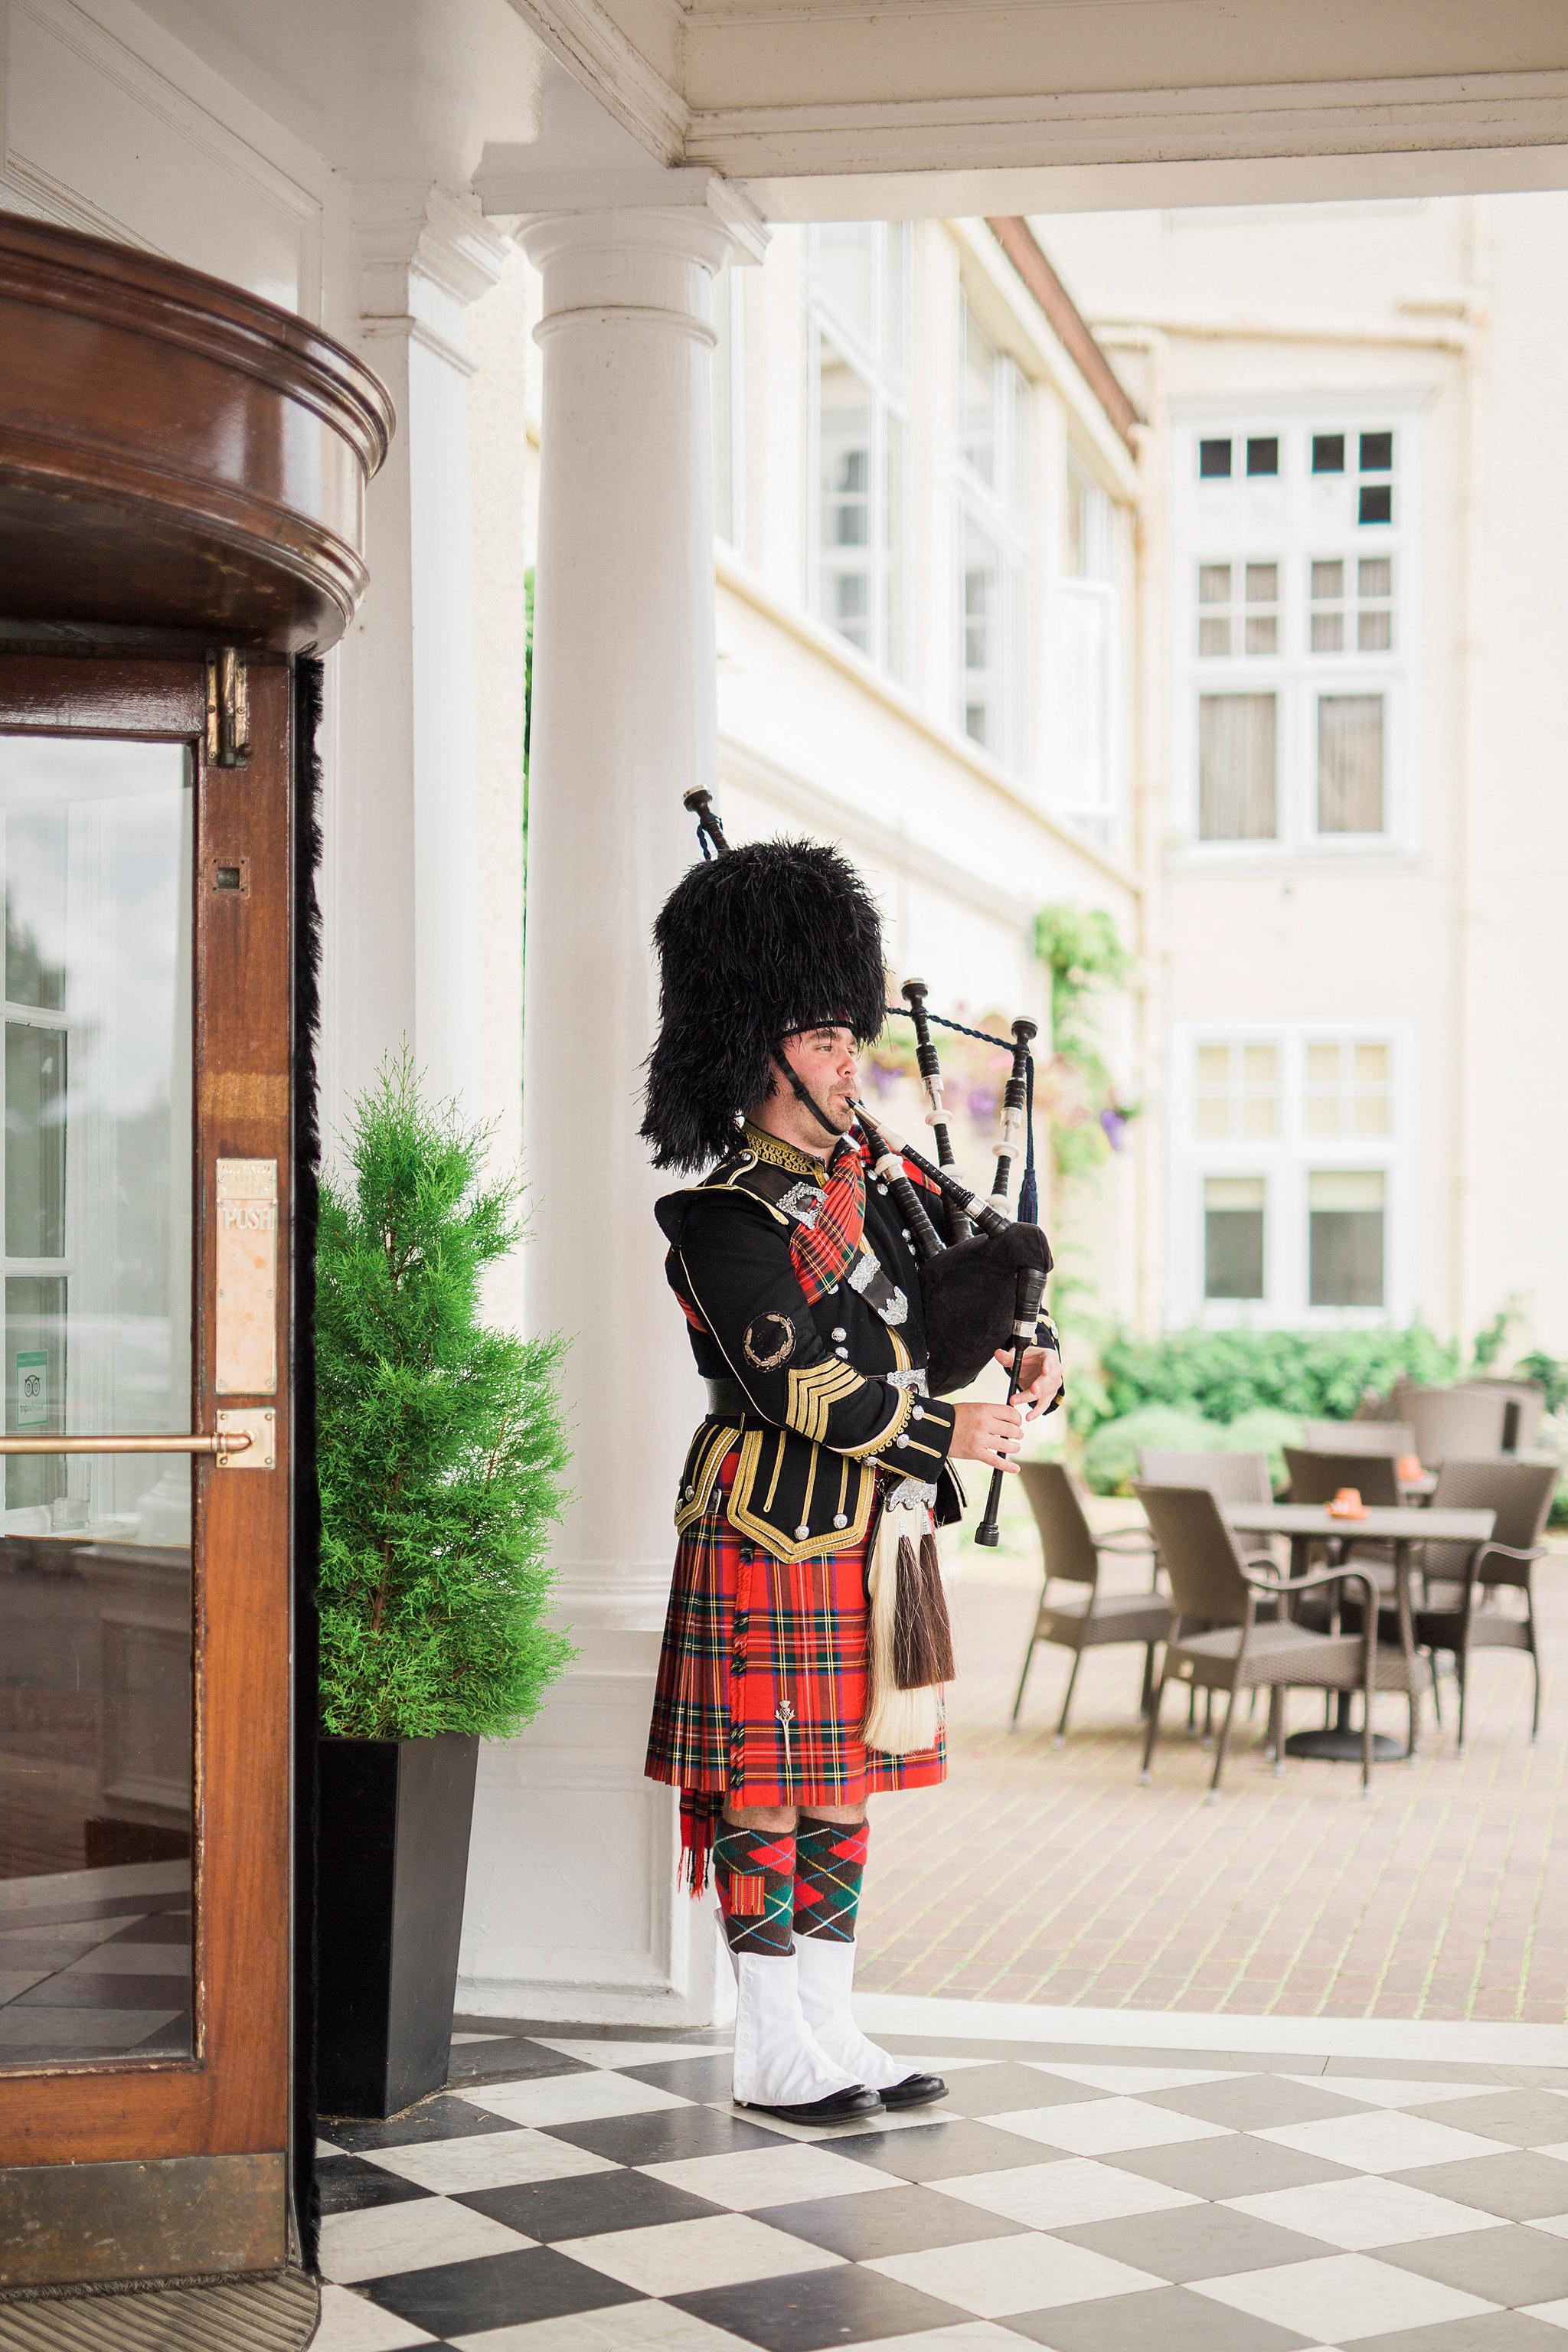 065-scotland-wedding-photographer.jpg